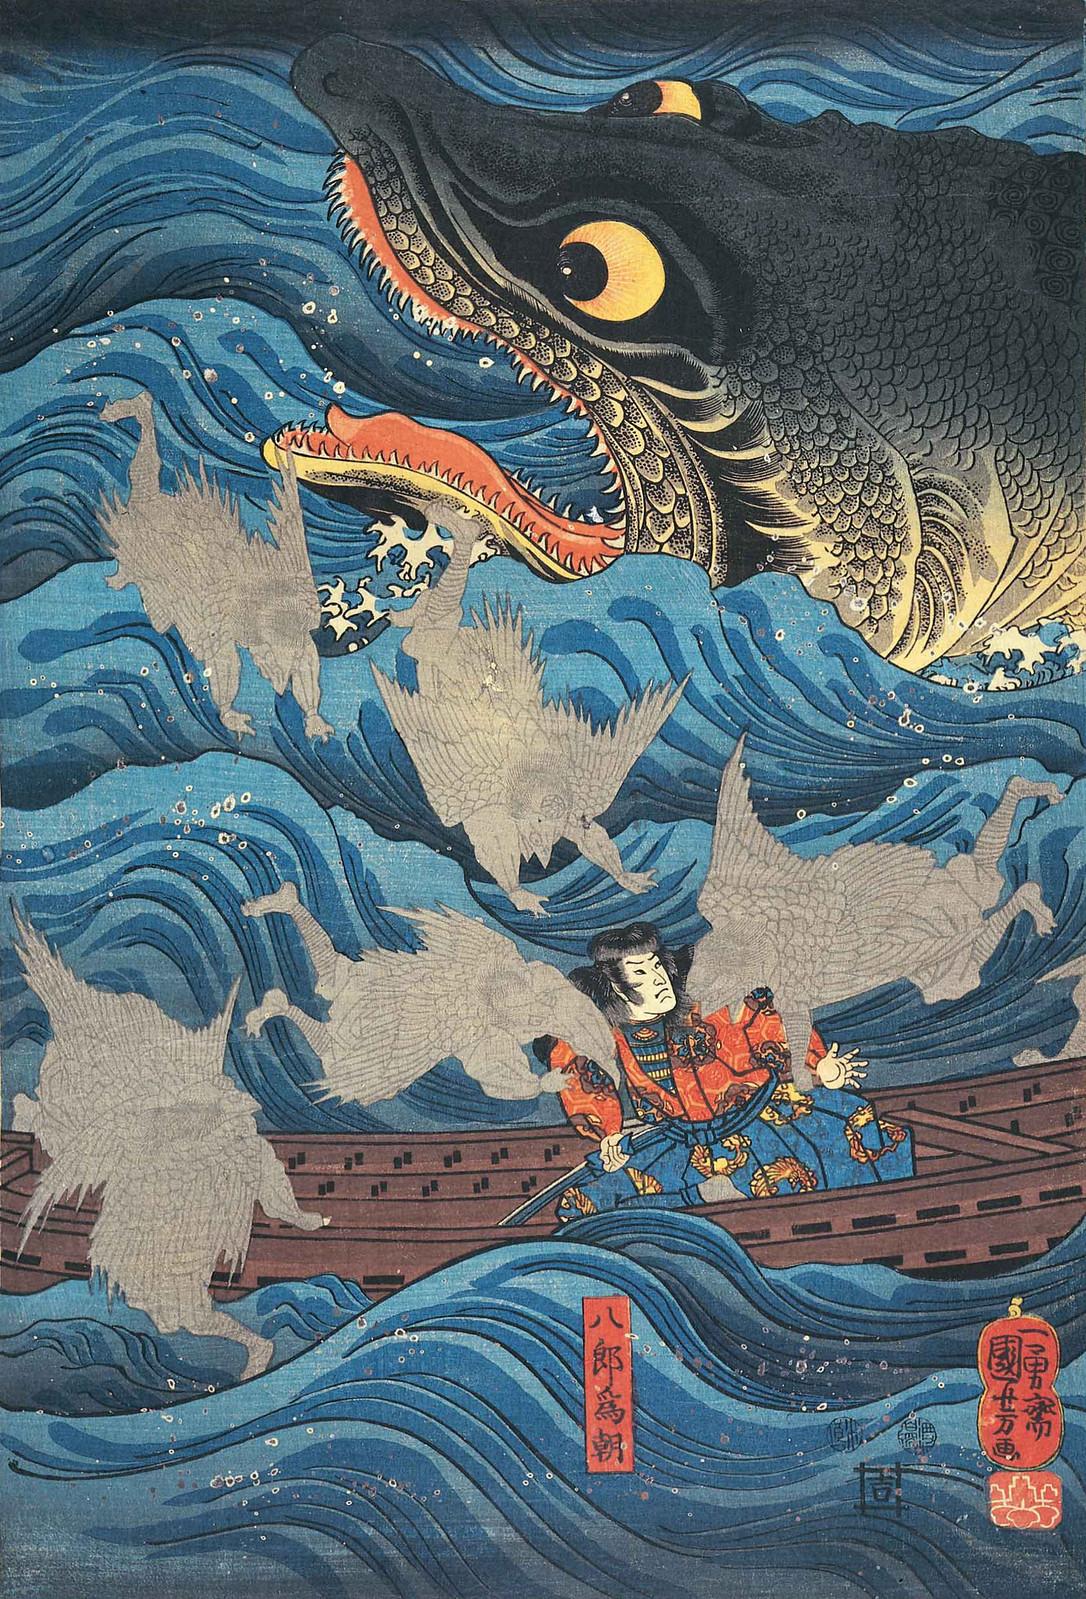 Utagawa Kuniyoshi - Retired Emperor Sanuki Sends Allies to Rescue Tametomo, Edo Period (left panel)